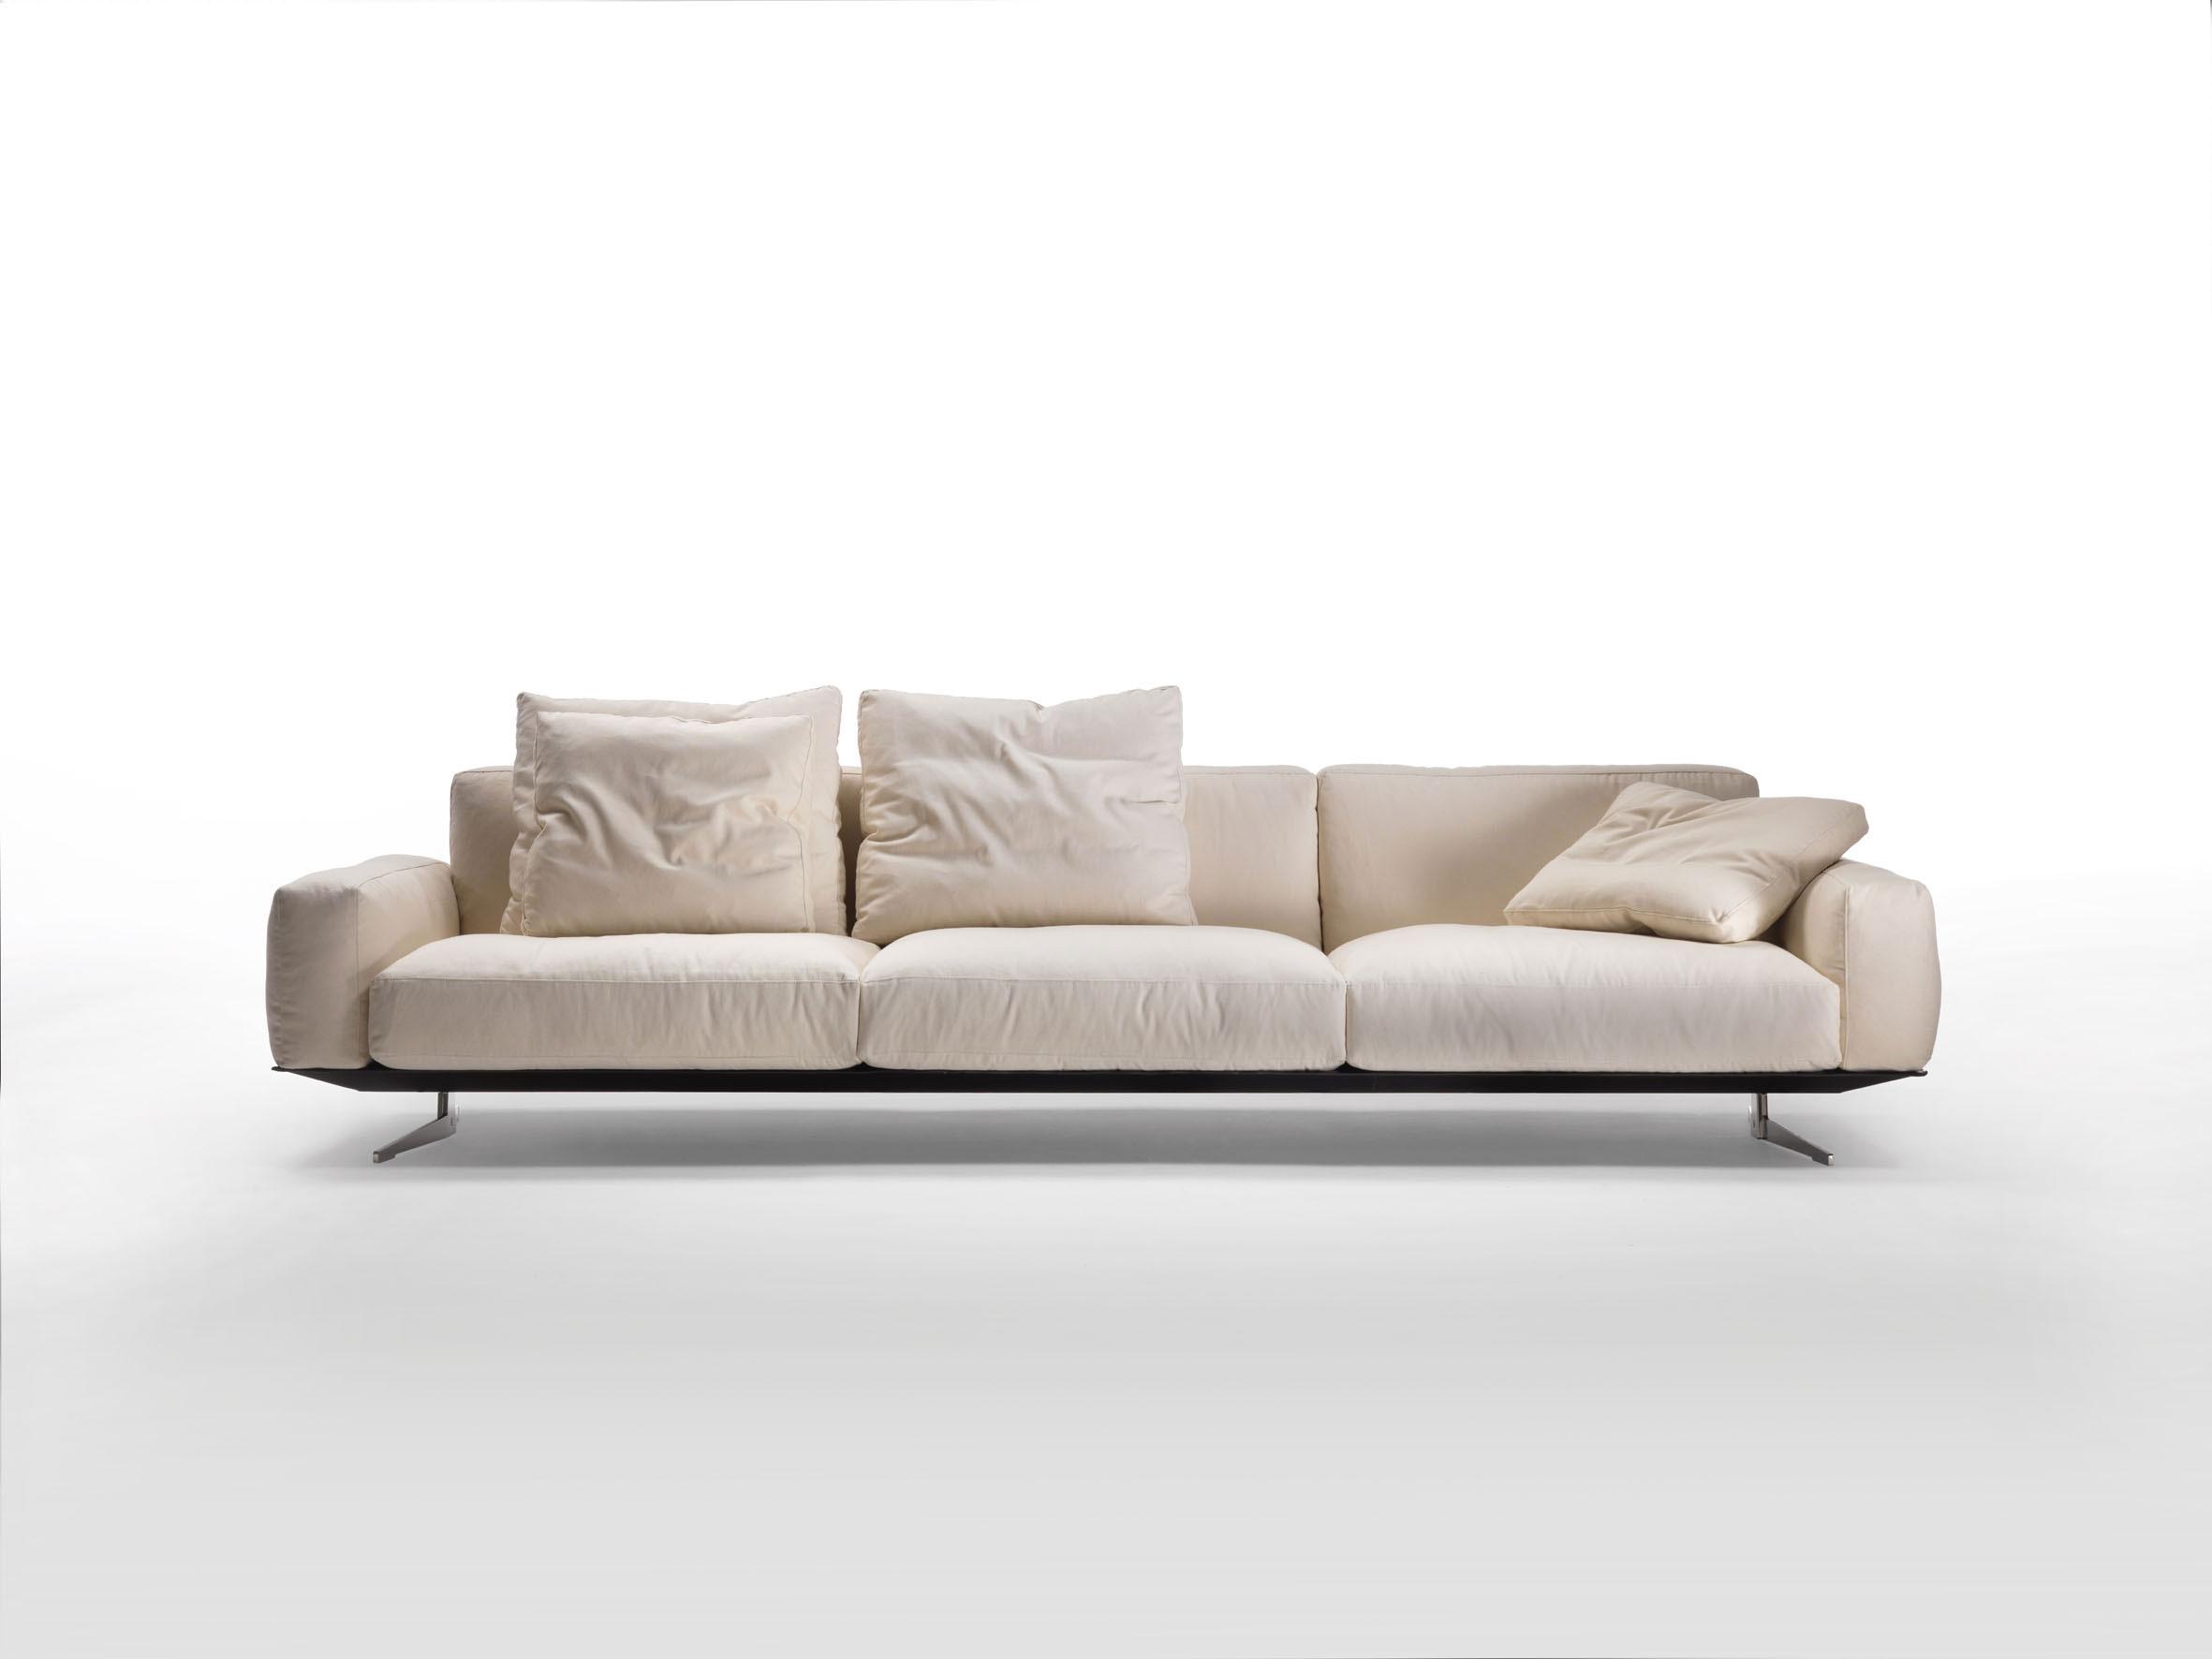 Full Size of Flexform Sofa Review Gary Bed Uk Cost Sale Groundpiece Gebraucht Furniture Winny Ebay Twins Romeo Spitzenmarken Planung Produkte Wetscher Antik Weiches Grau Sofa Flexform Sofa